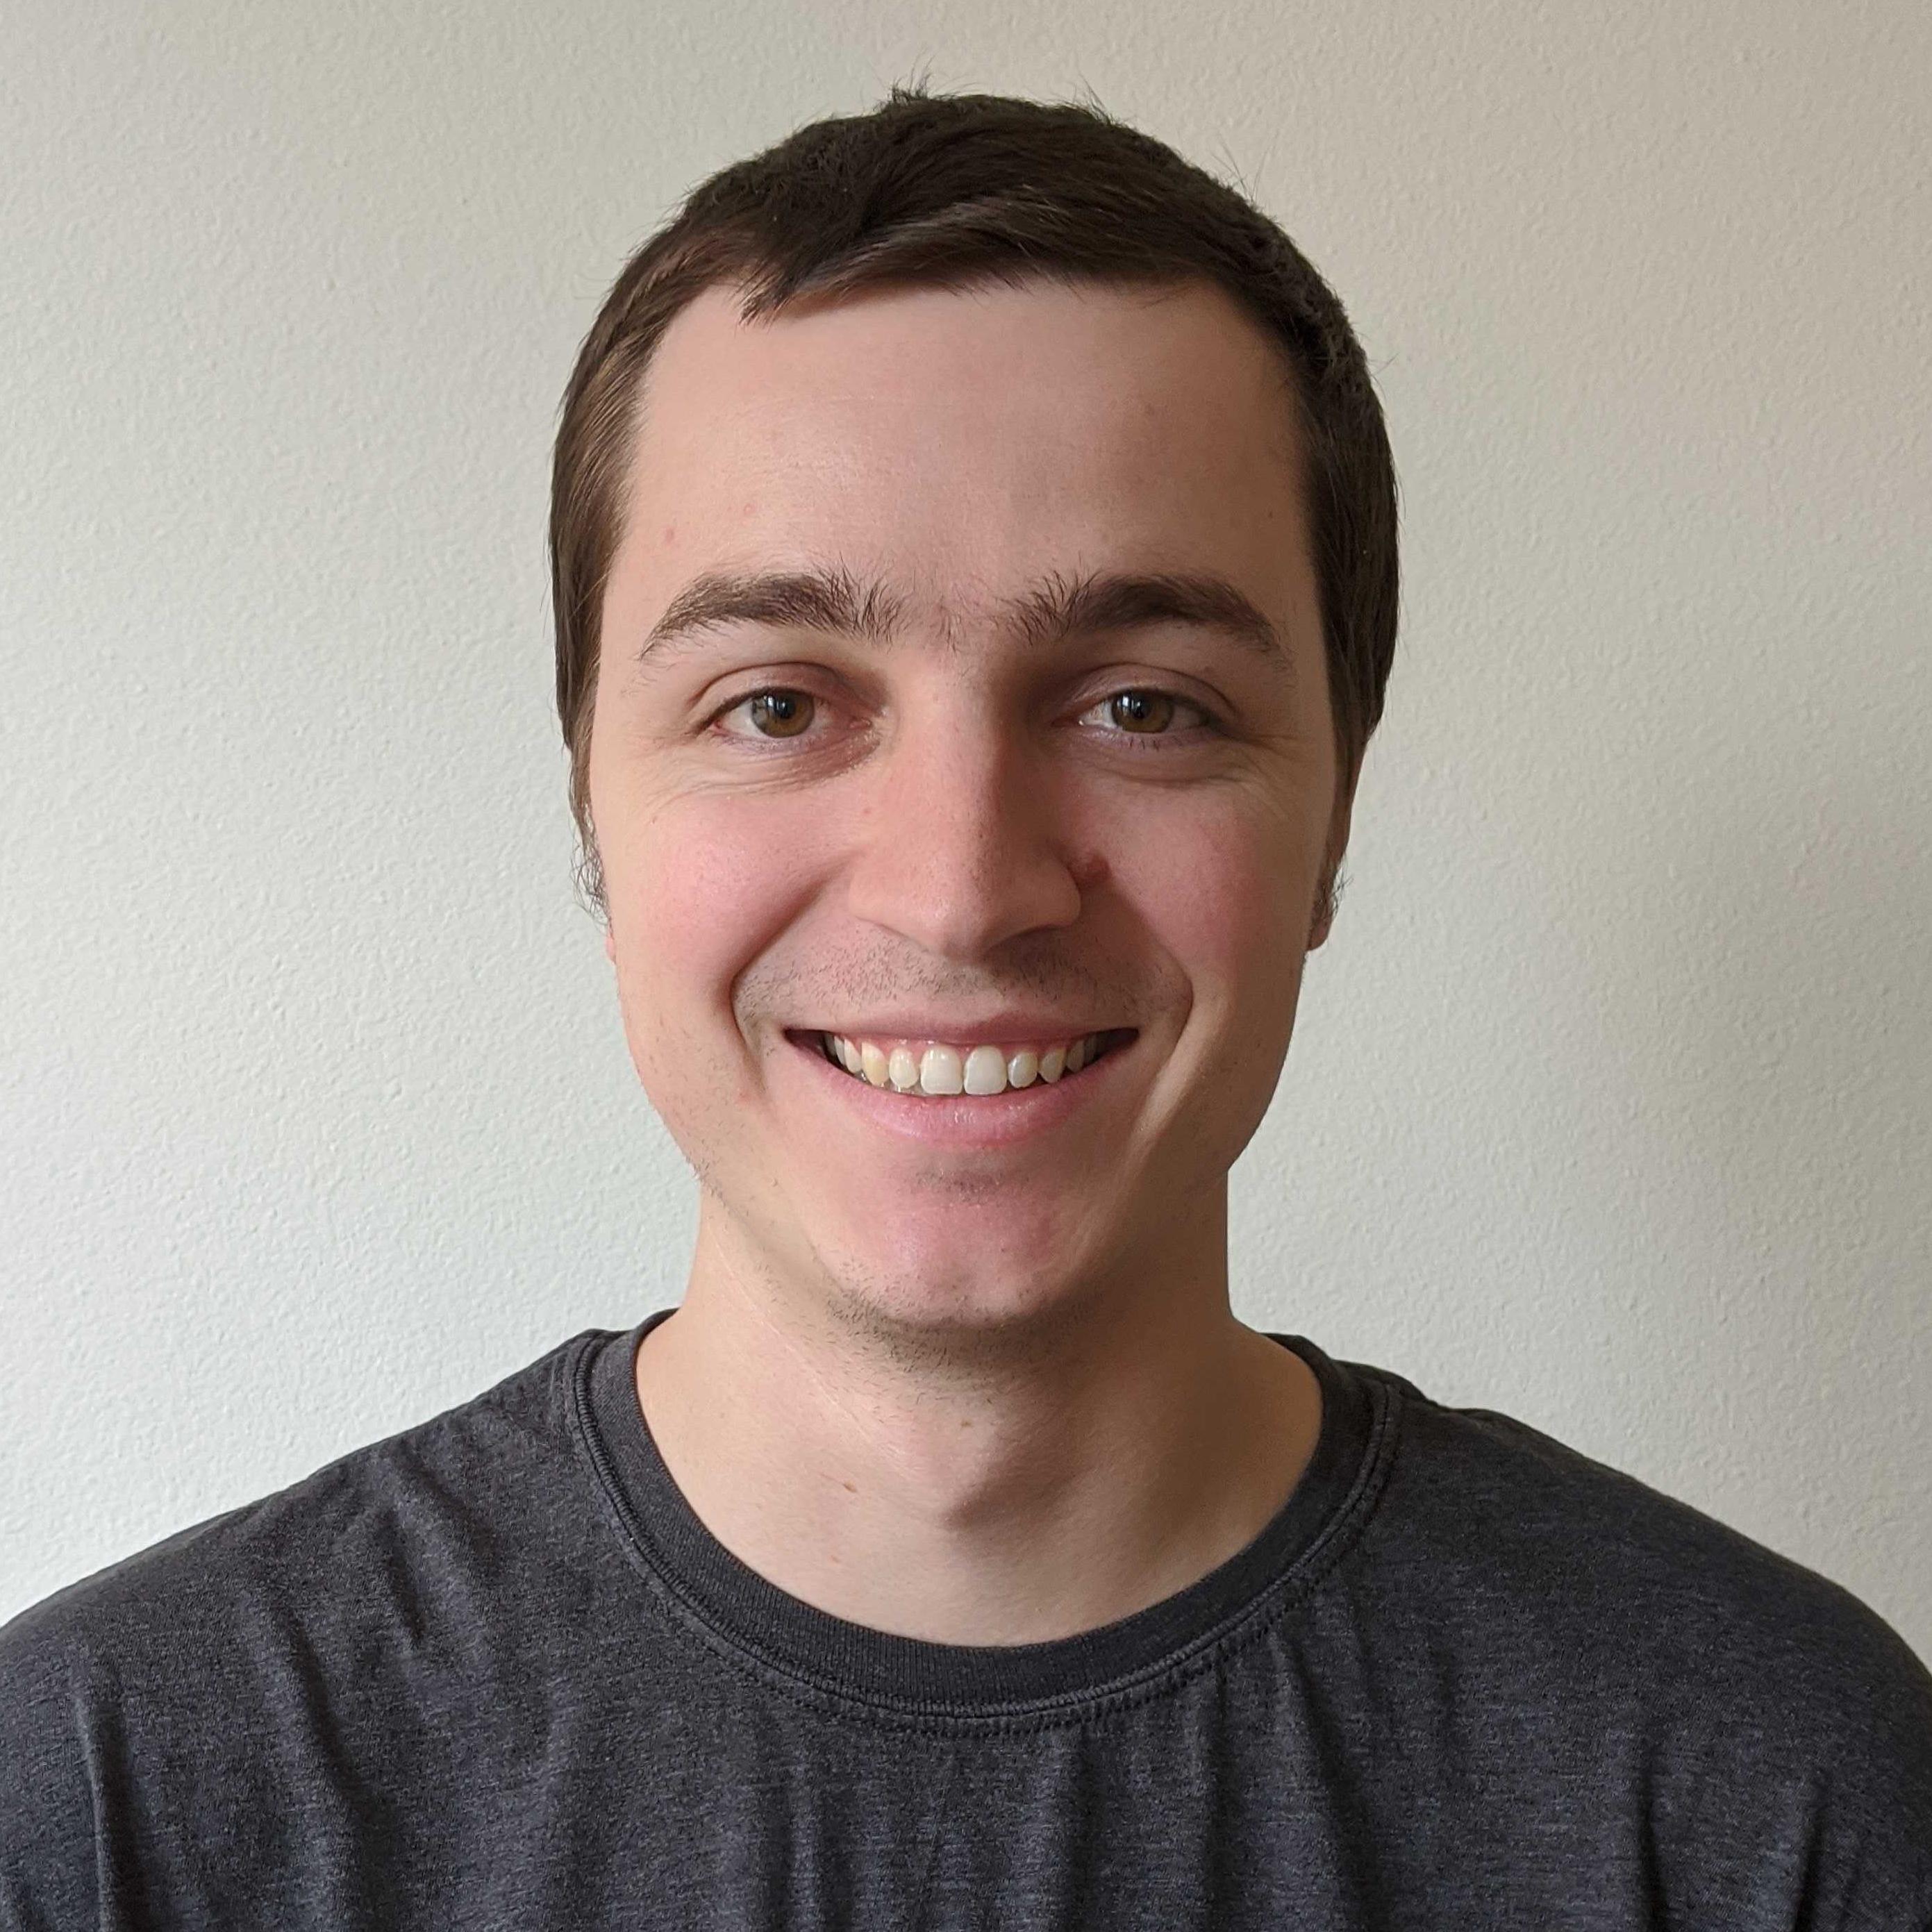 Ryan Zambrano